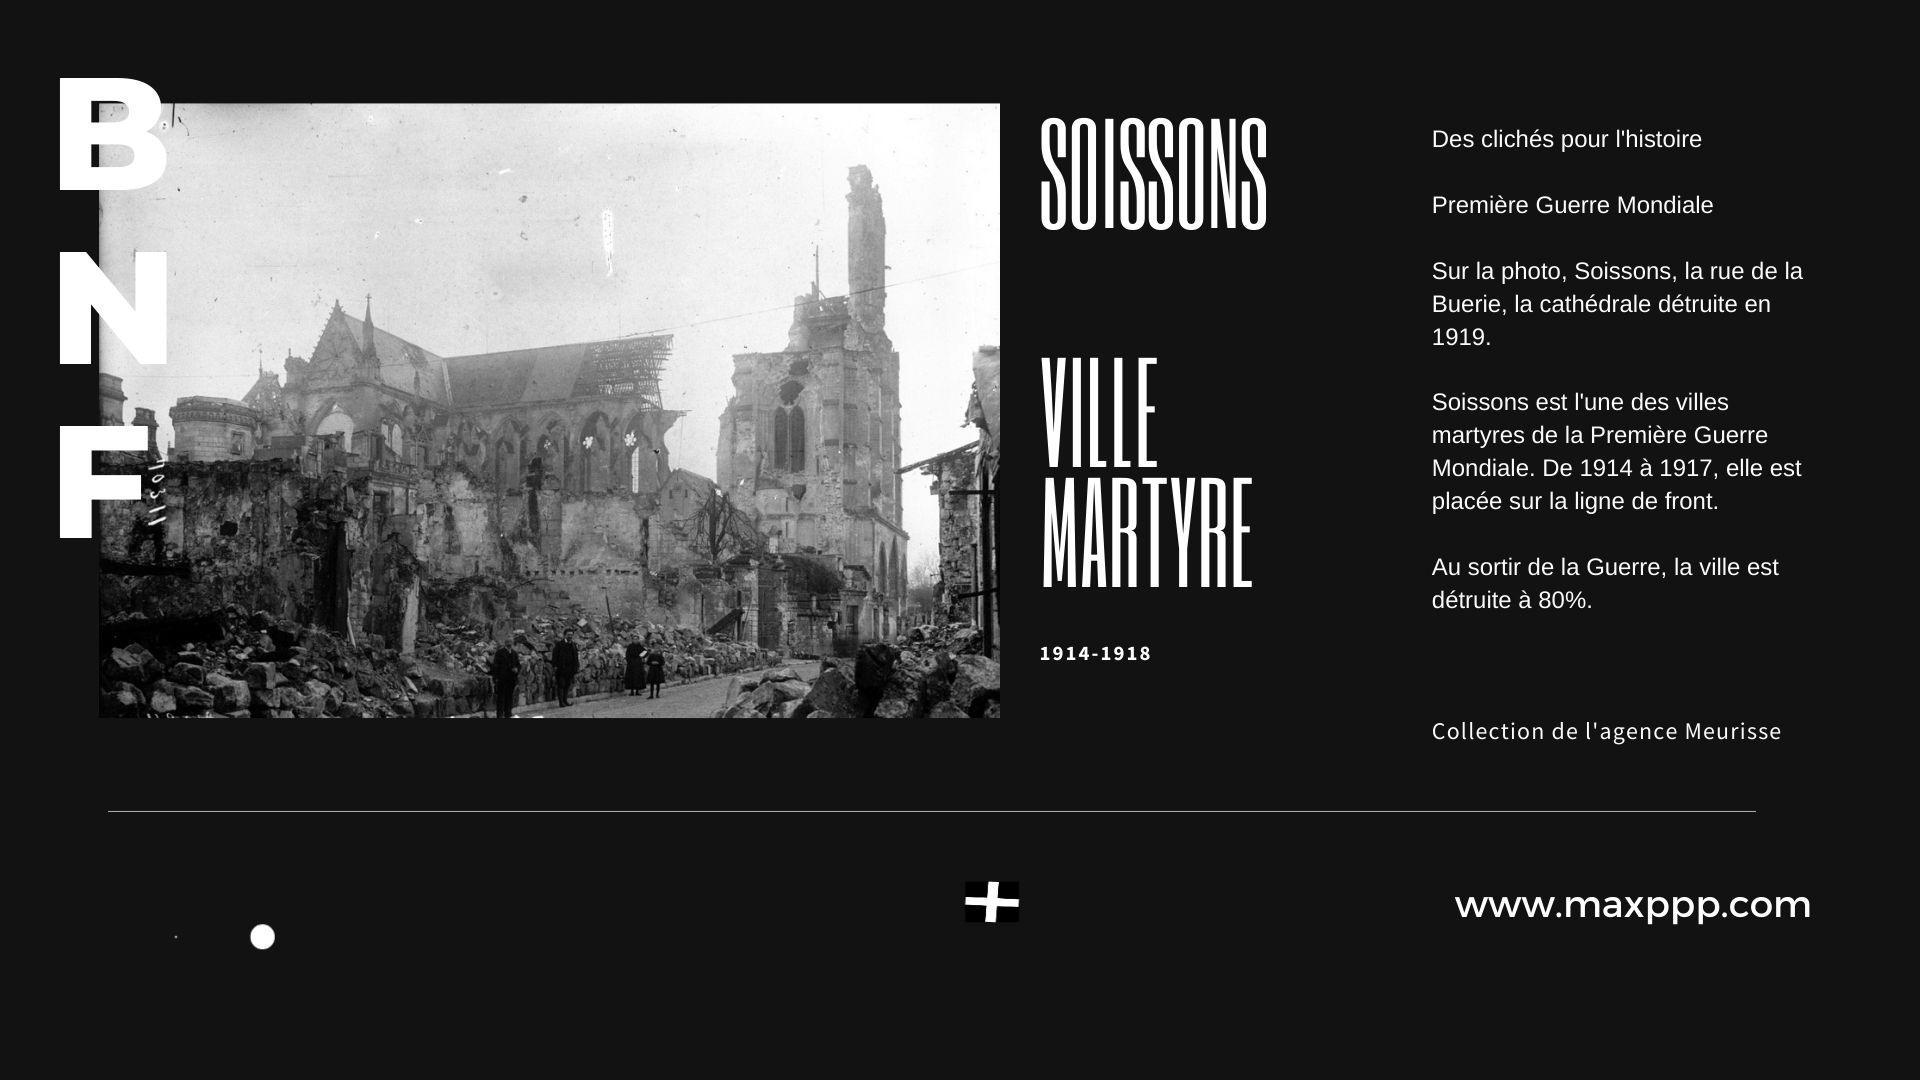 Soissons, ville martyre